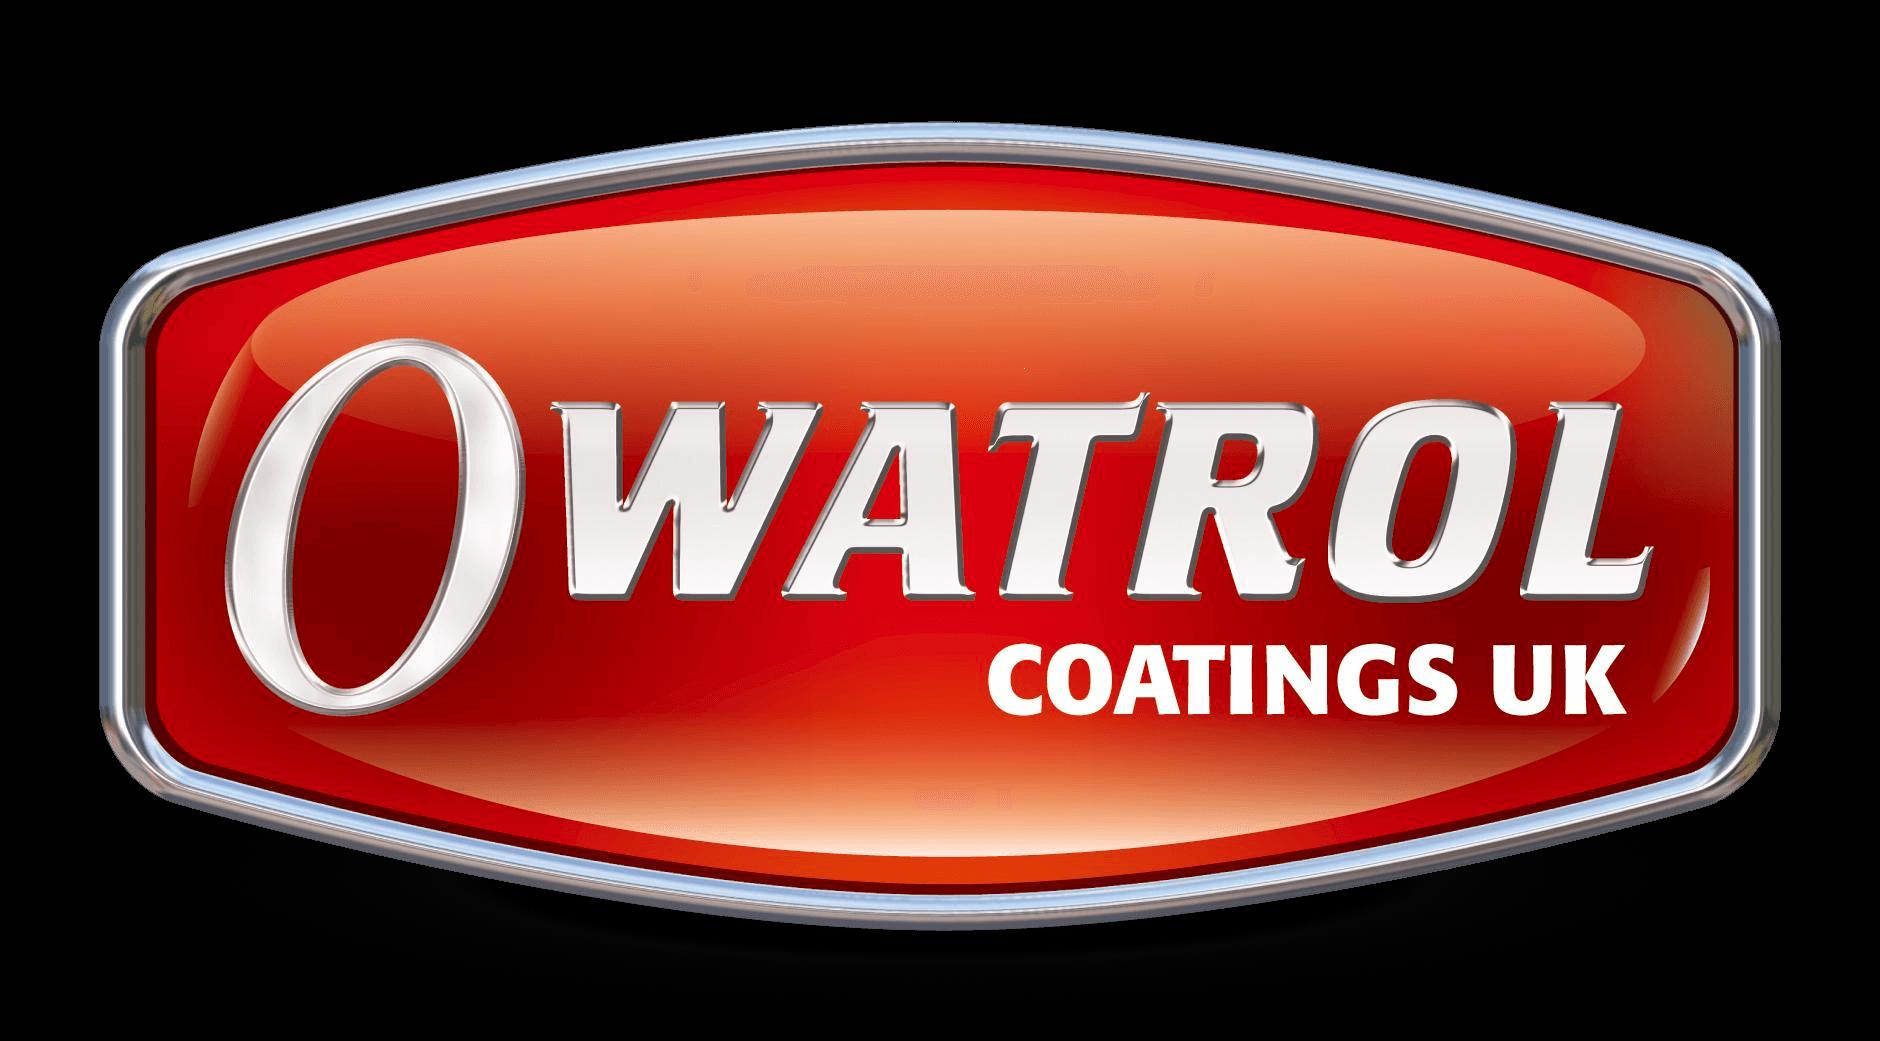 Owatrol UK logo